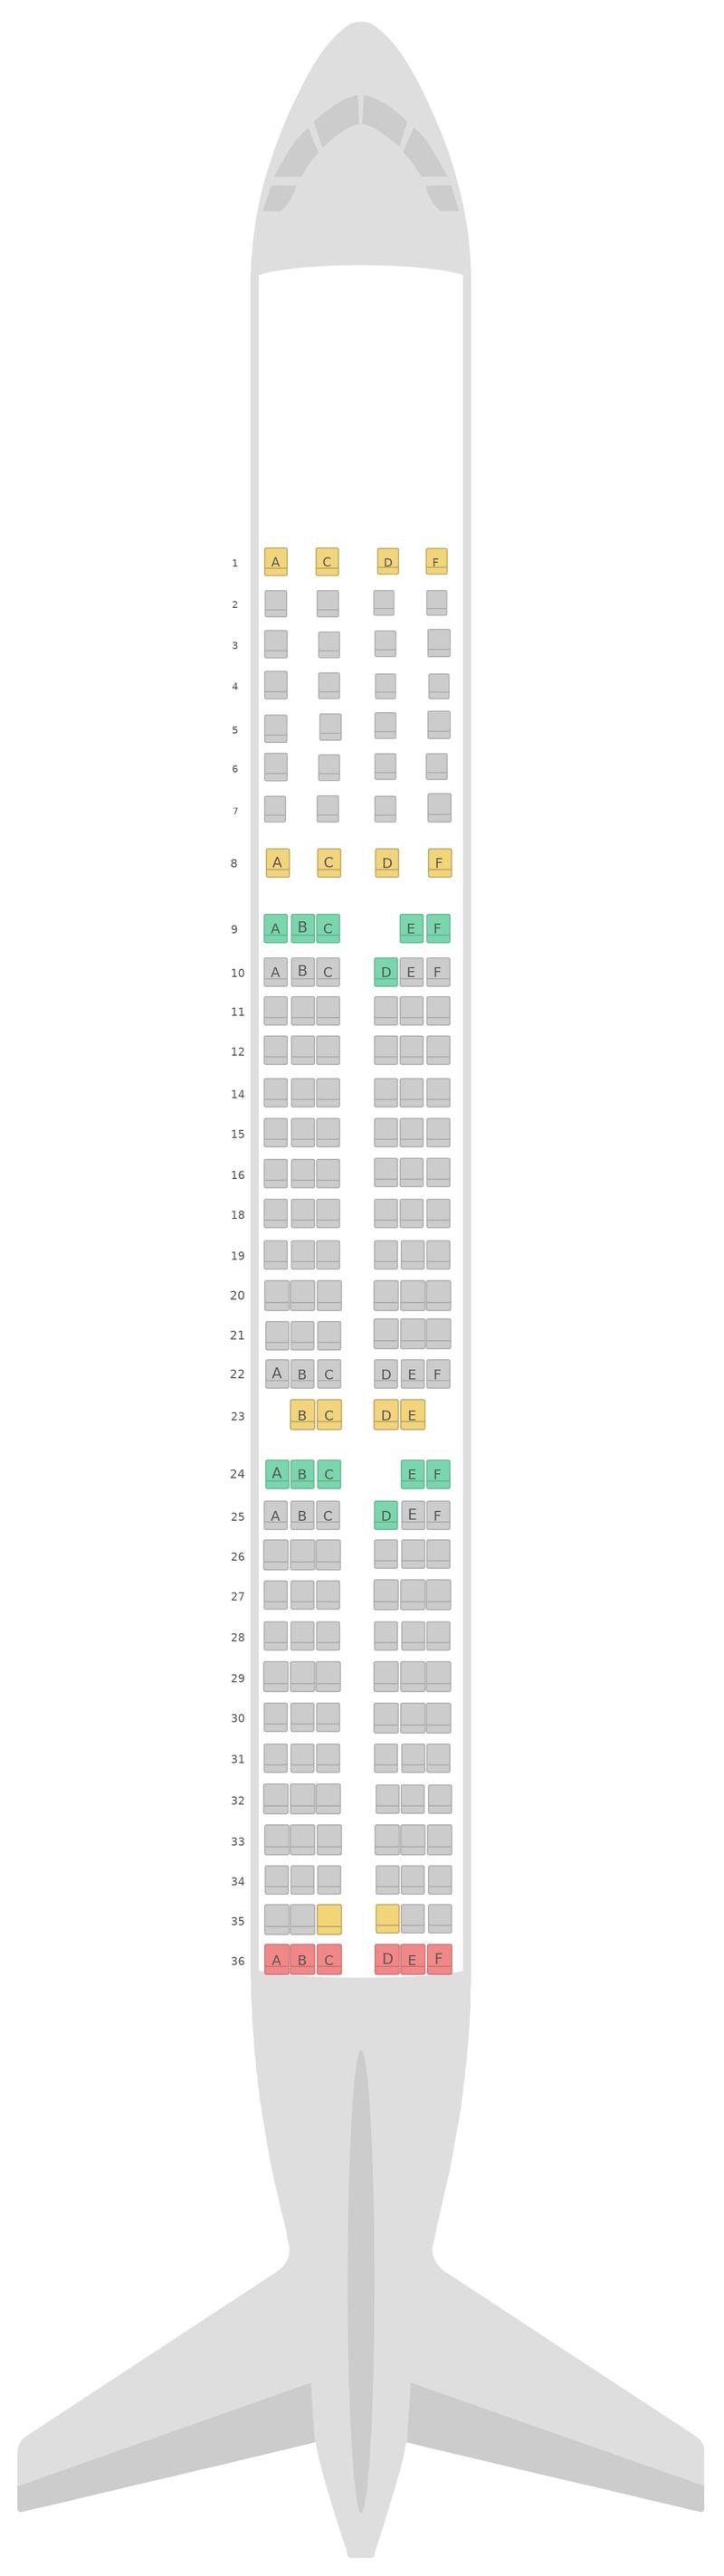 Sitzplan Airbus A321 v1 Alitalia